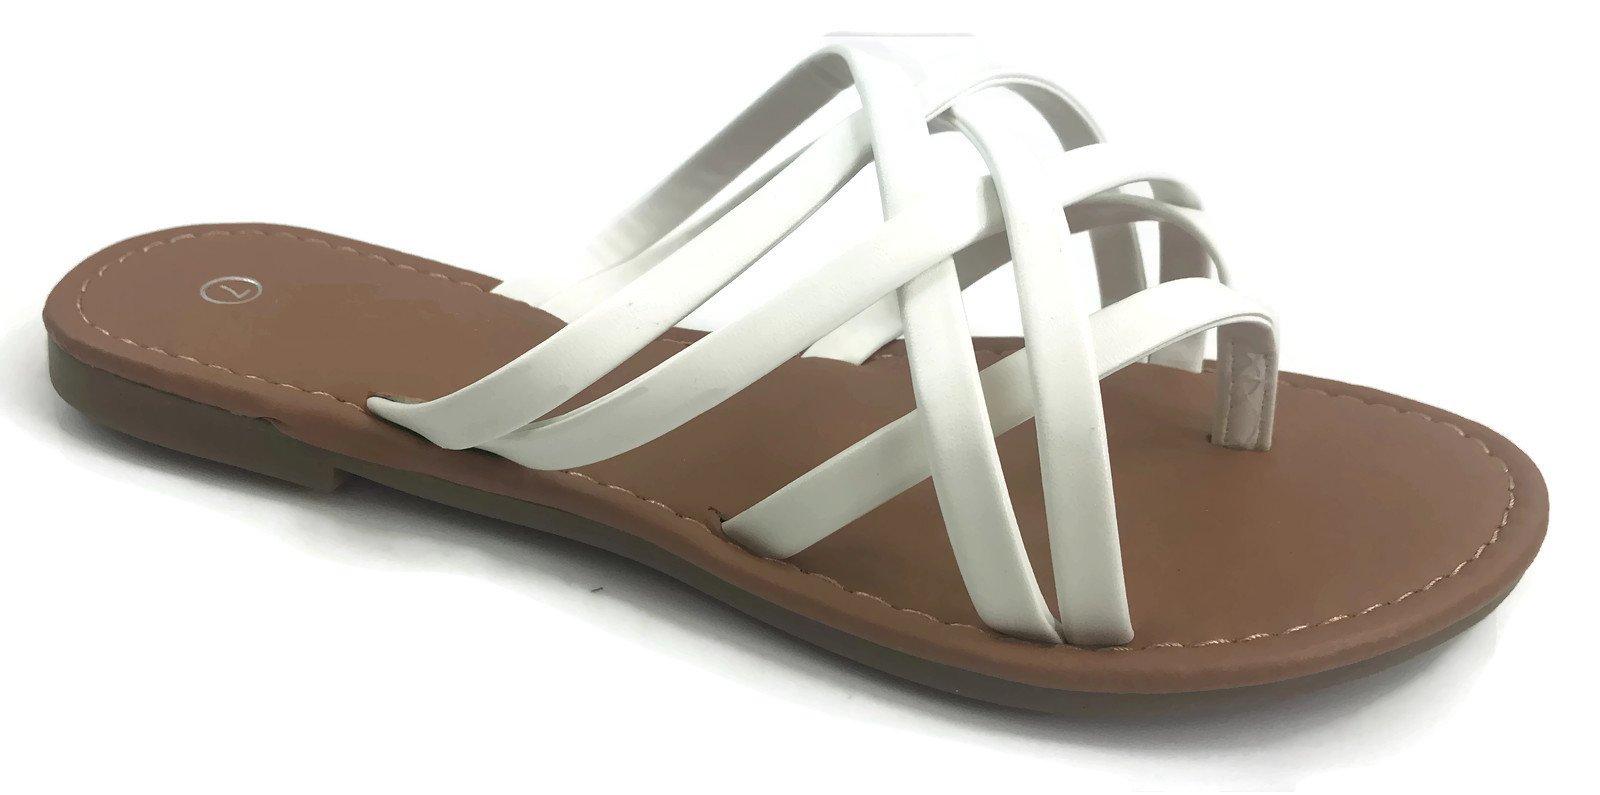 d14ef6d08 Galleon - Girls Club Alva Flip Flops Strappy Summer Sandal Criss Cross  Double Straps